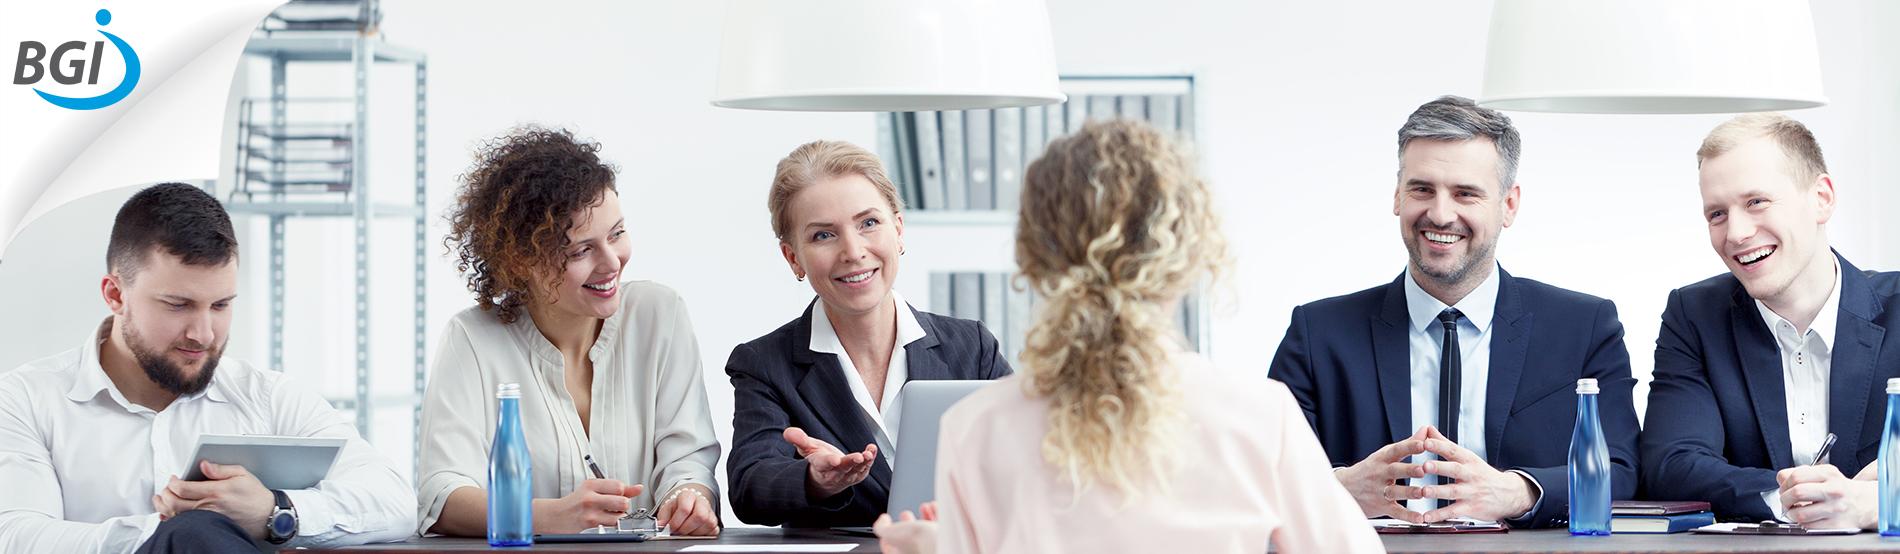 Personalmanagement - Schwerpunkt Arbeitsrecht